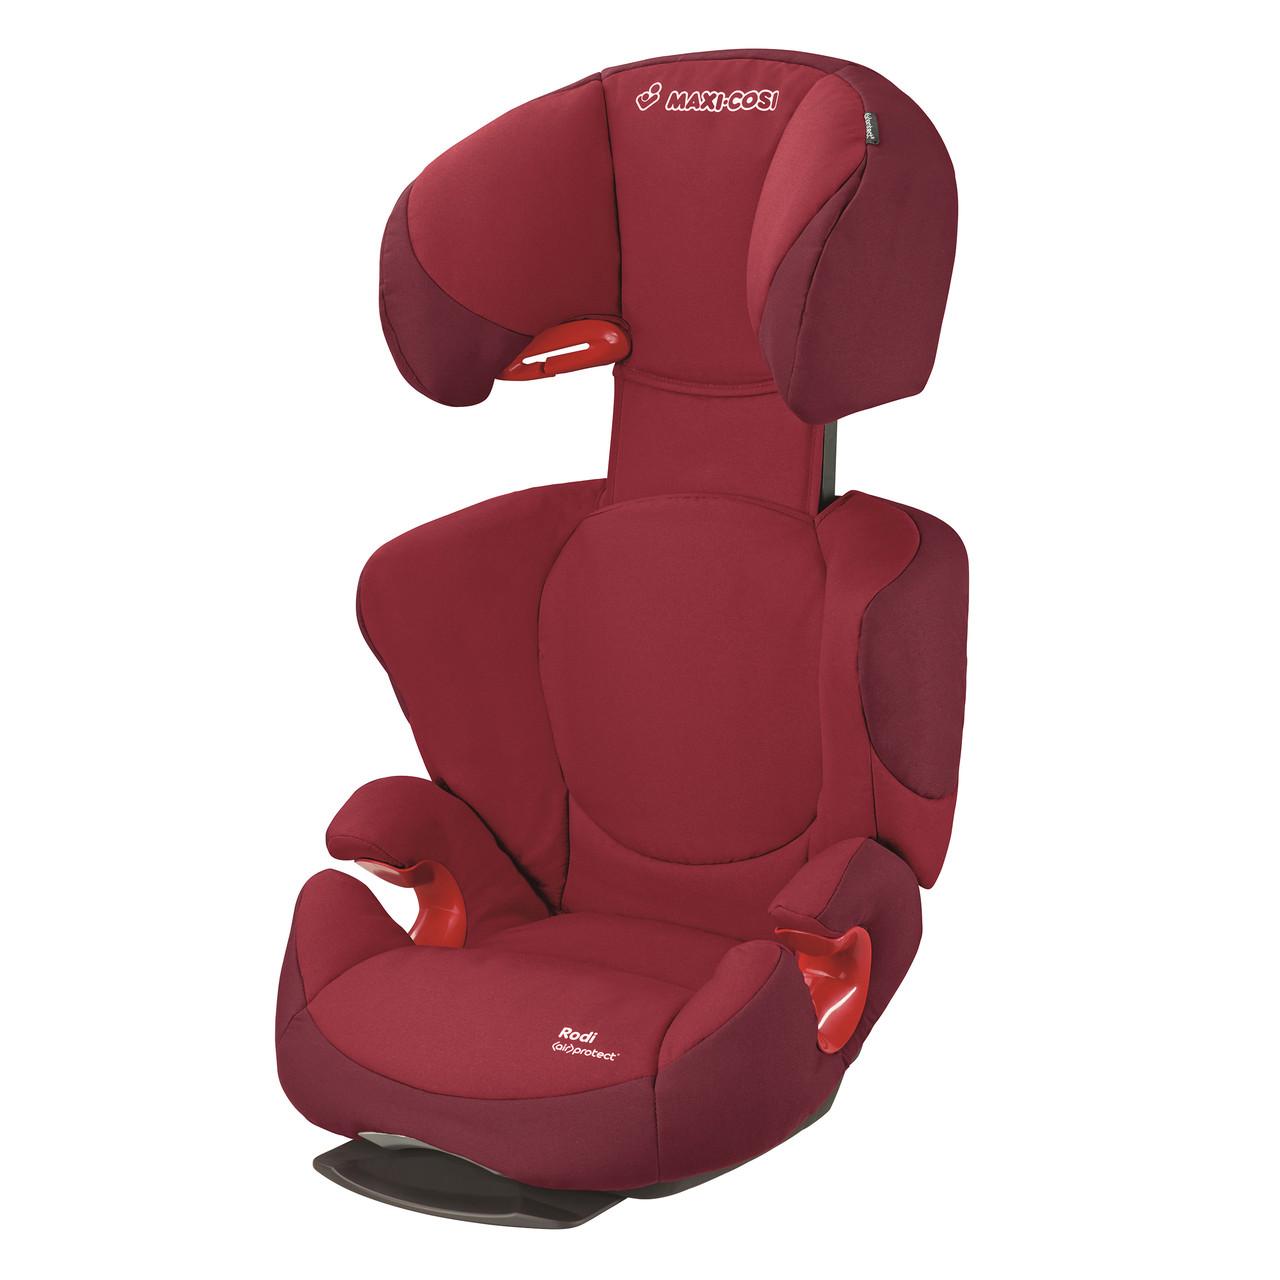 Автокресло Maxi Cosi Rodi AP 15-36 кг (75108140) Raspberry Red (красный)